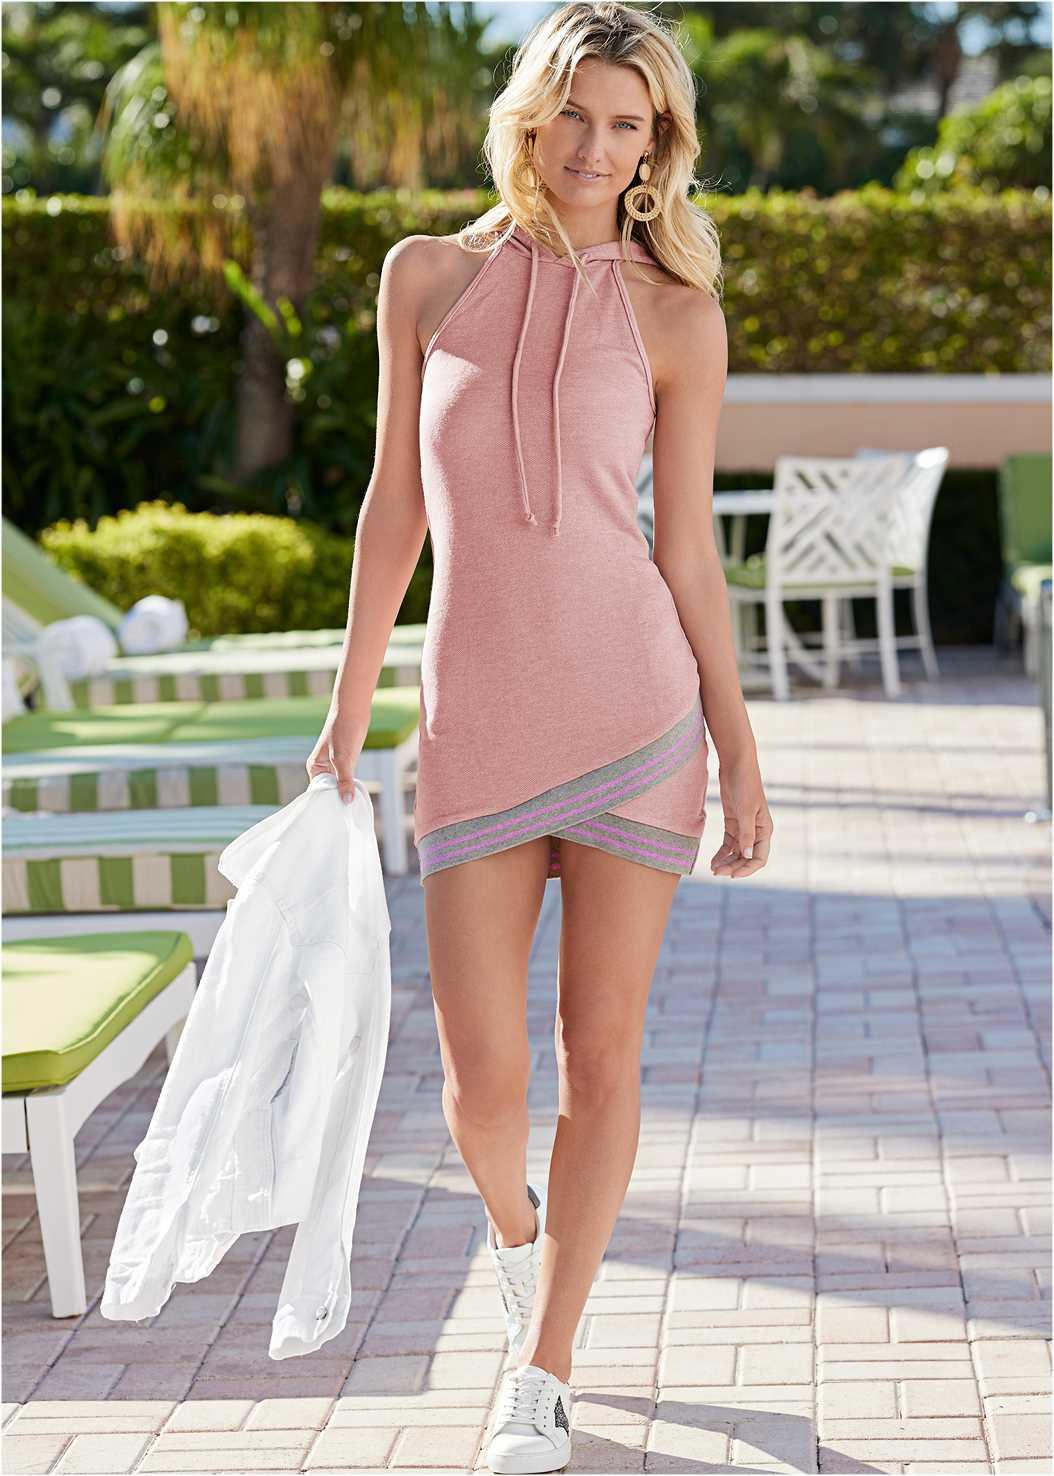 Hooded Detail Dress,Kissable Convertible Bra,Embellished Espadrilles,Beaded Wings Tote Bag,Jean Jacket